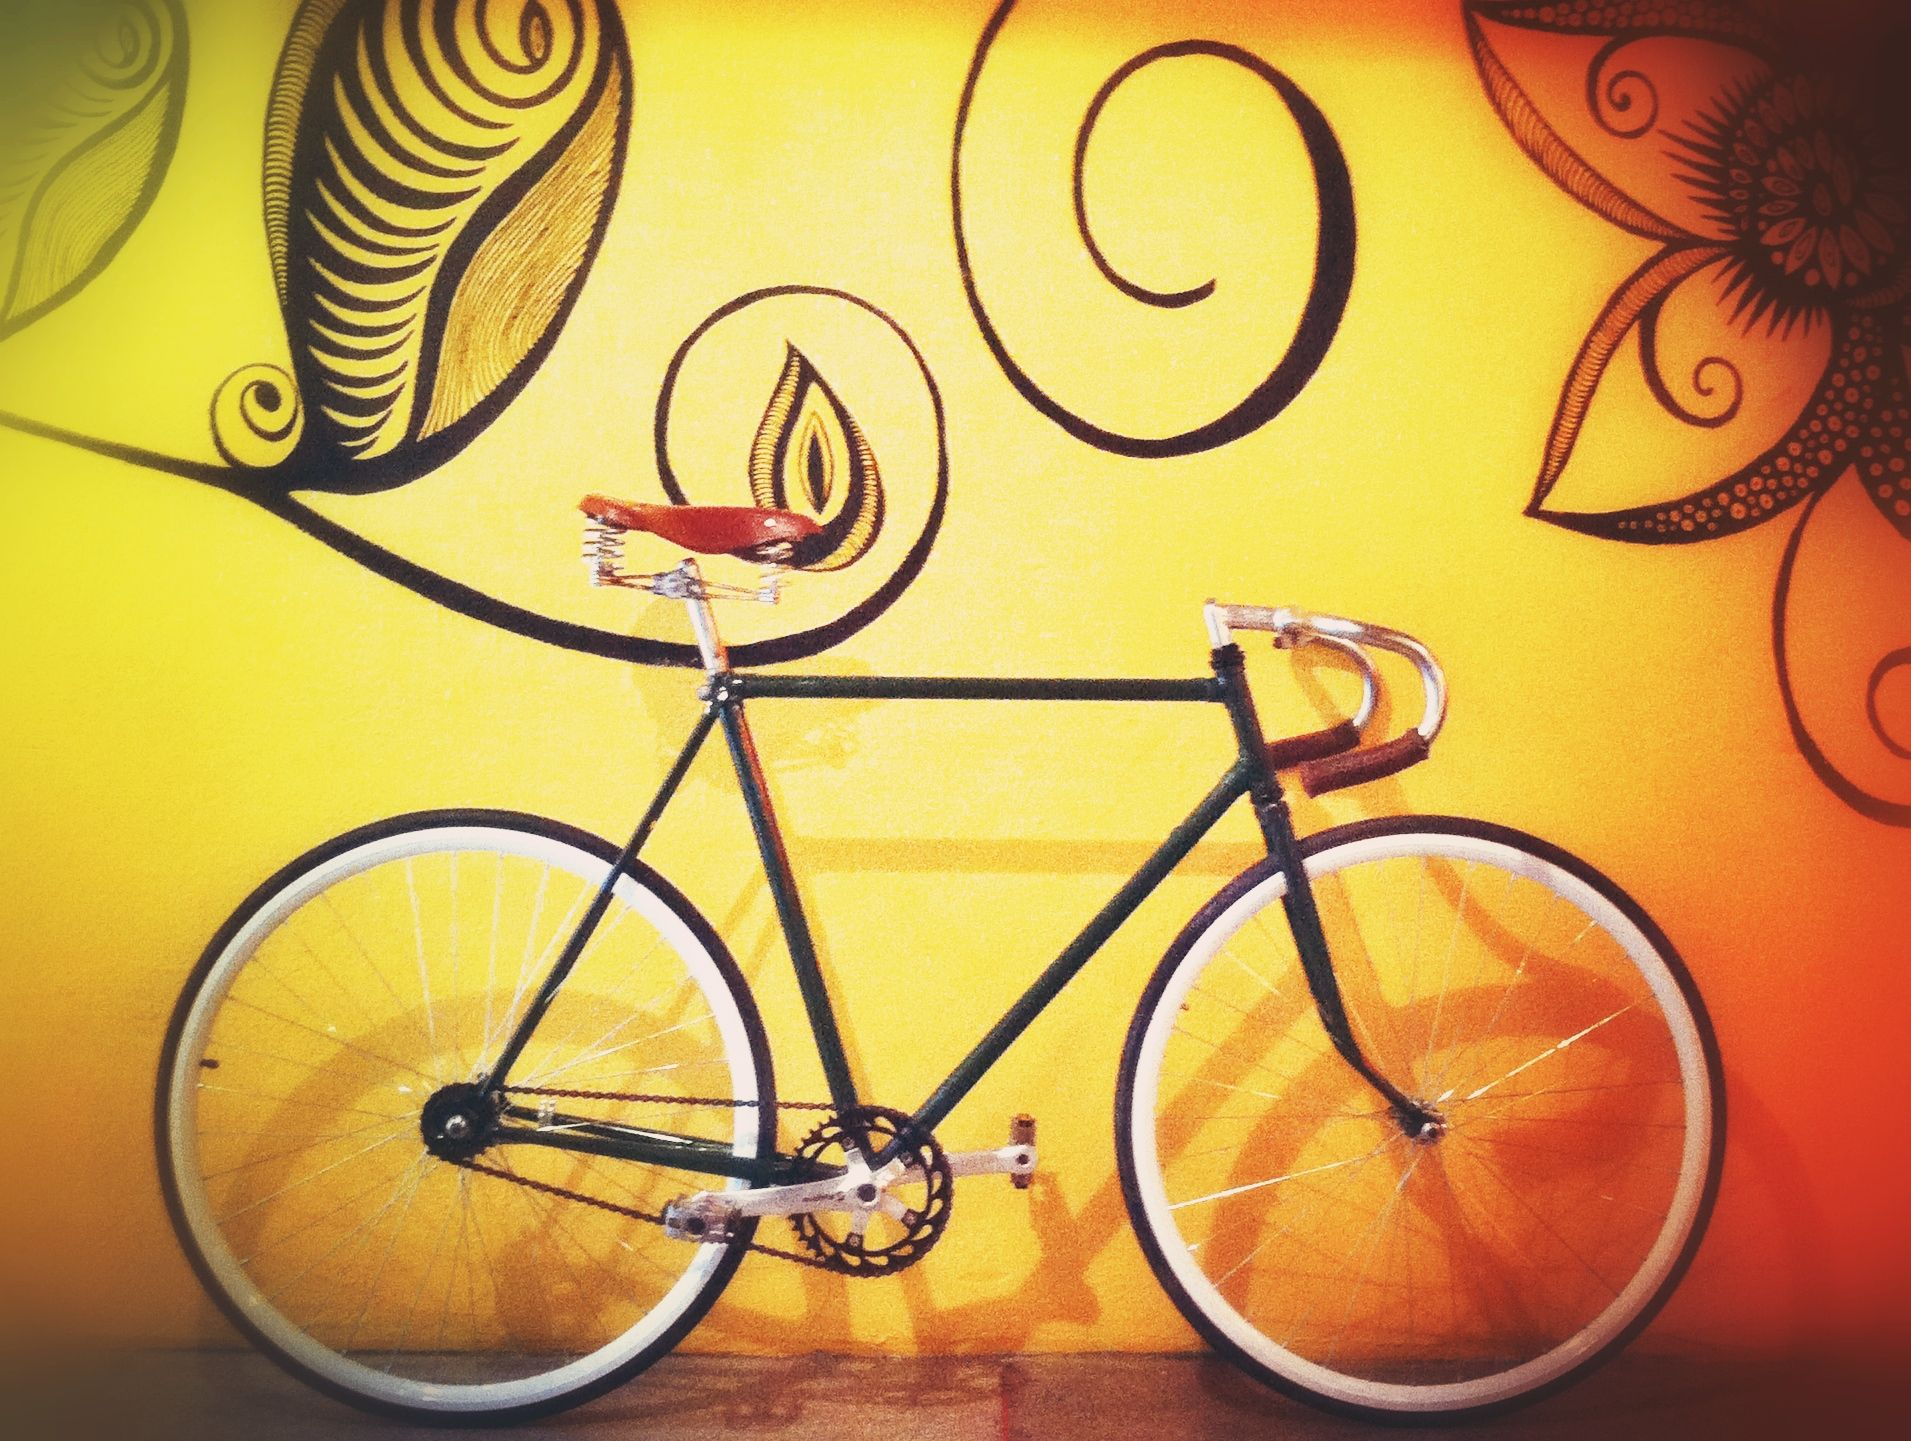 My vintage bike reformed. #bike #caloi #70's